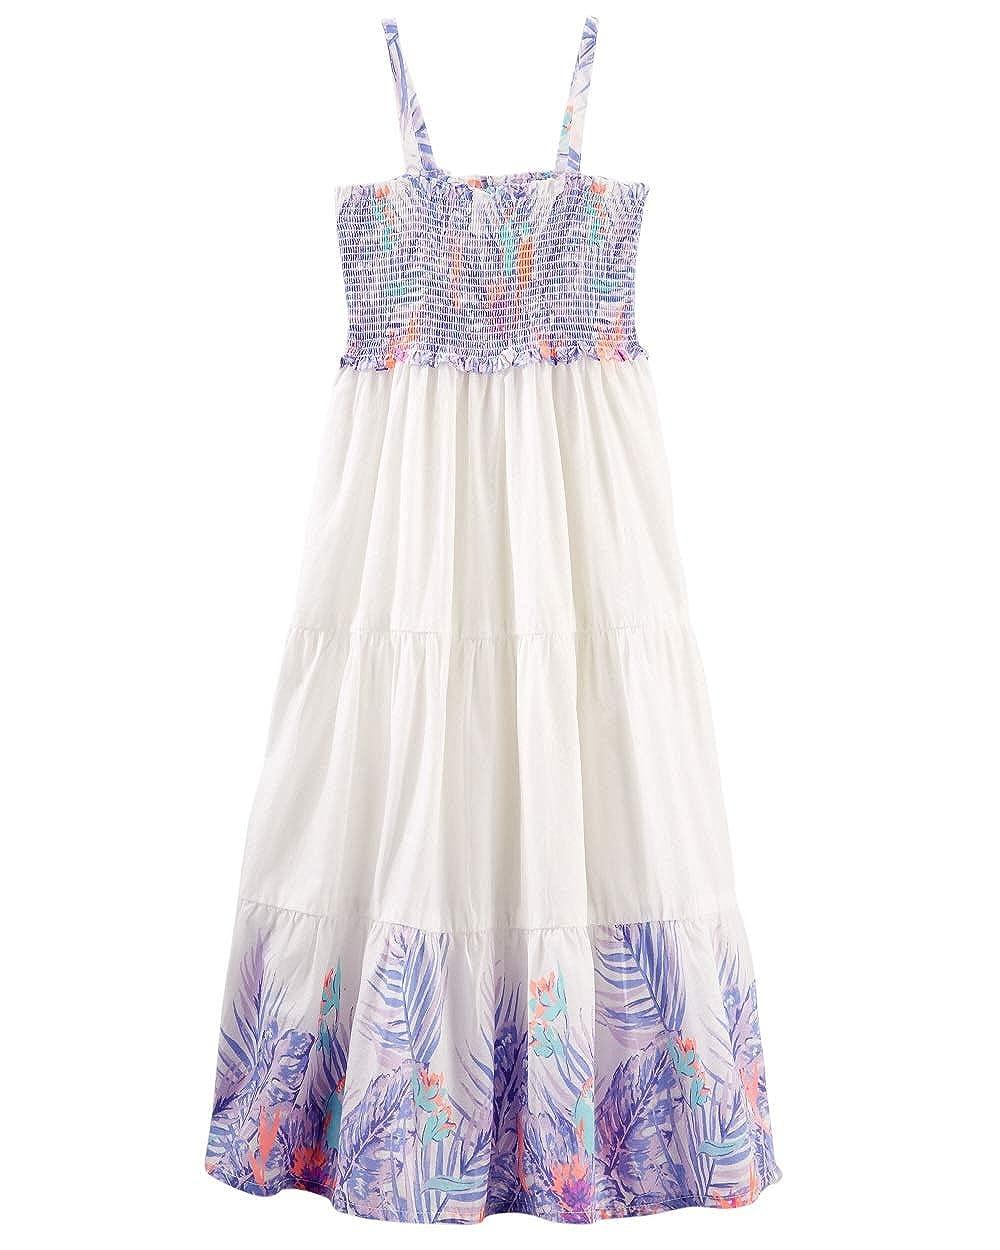 12 Months White OshKosh BGosh Baby Girls 2-Piece Tiered Boho Maxi Dress